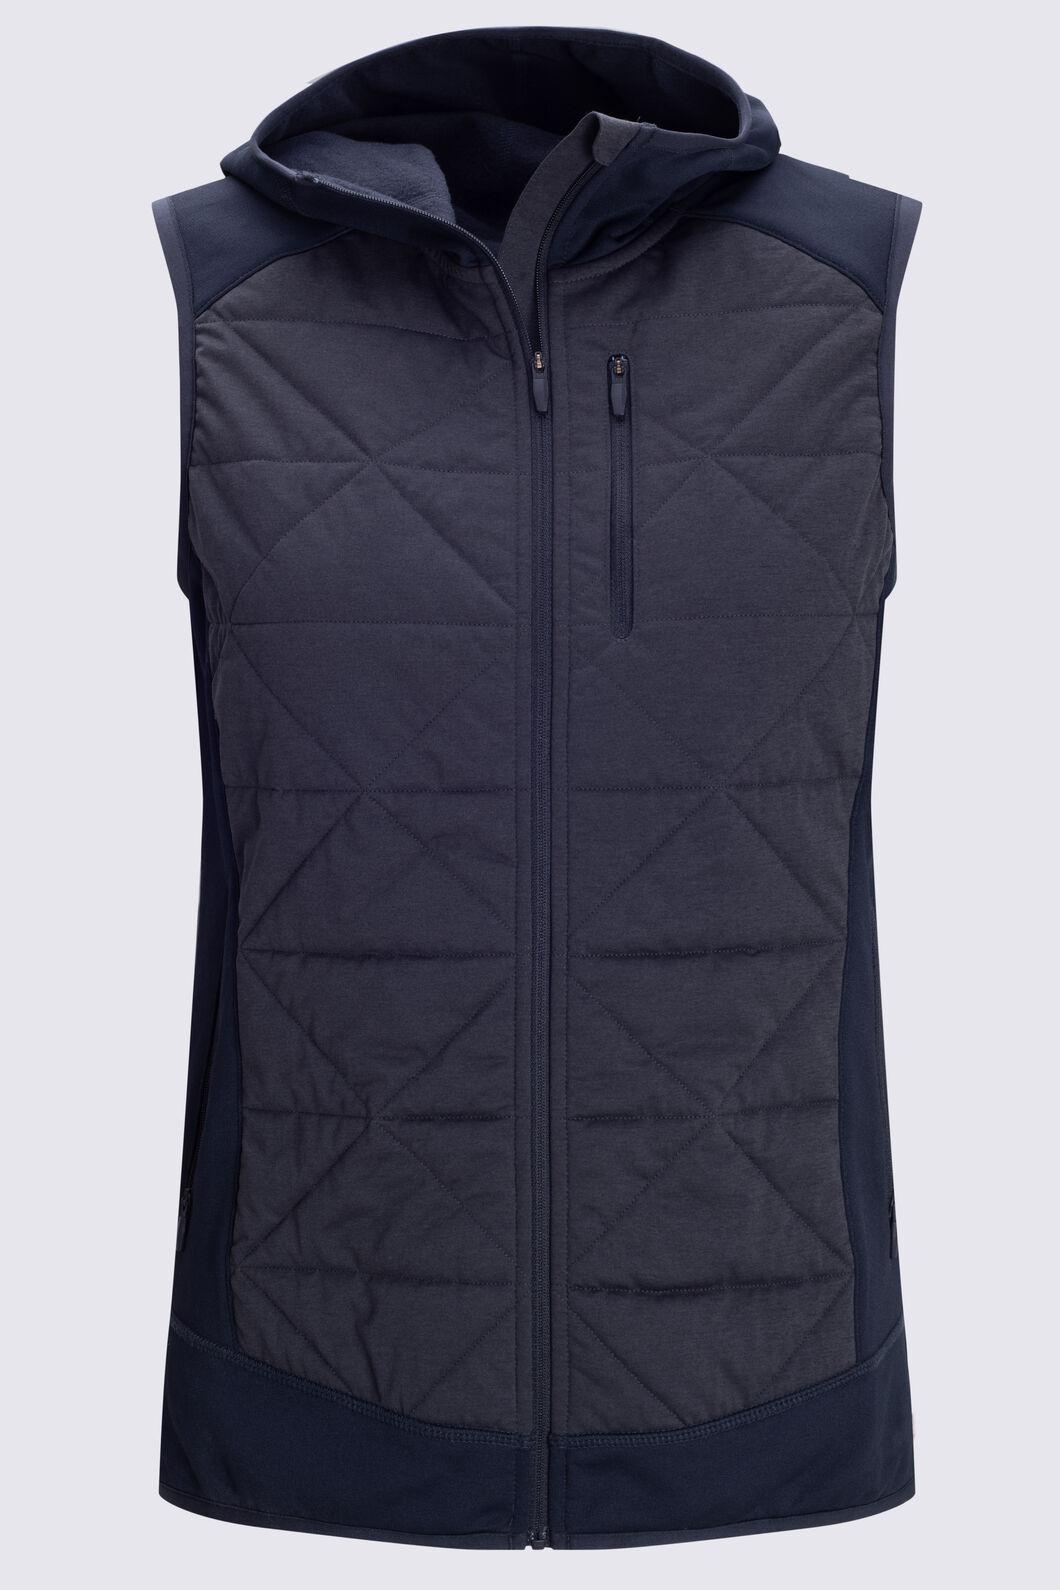 Macpac Women's Accelerate PrimaLoft® Fleece Vest, Black, hi-res